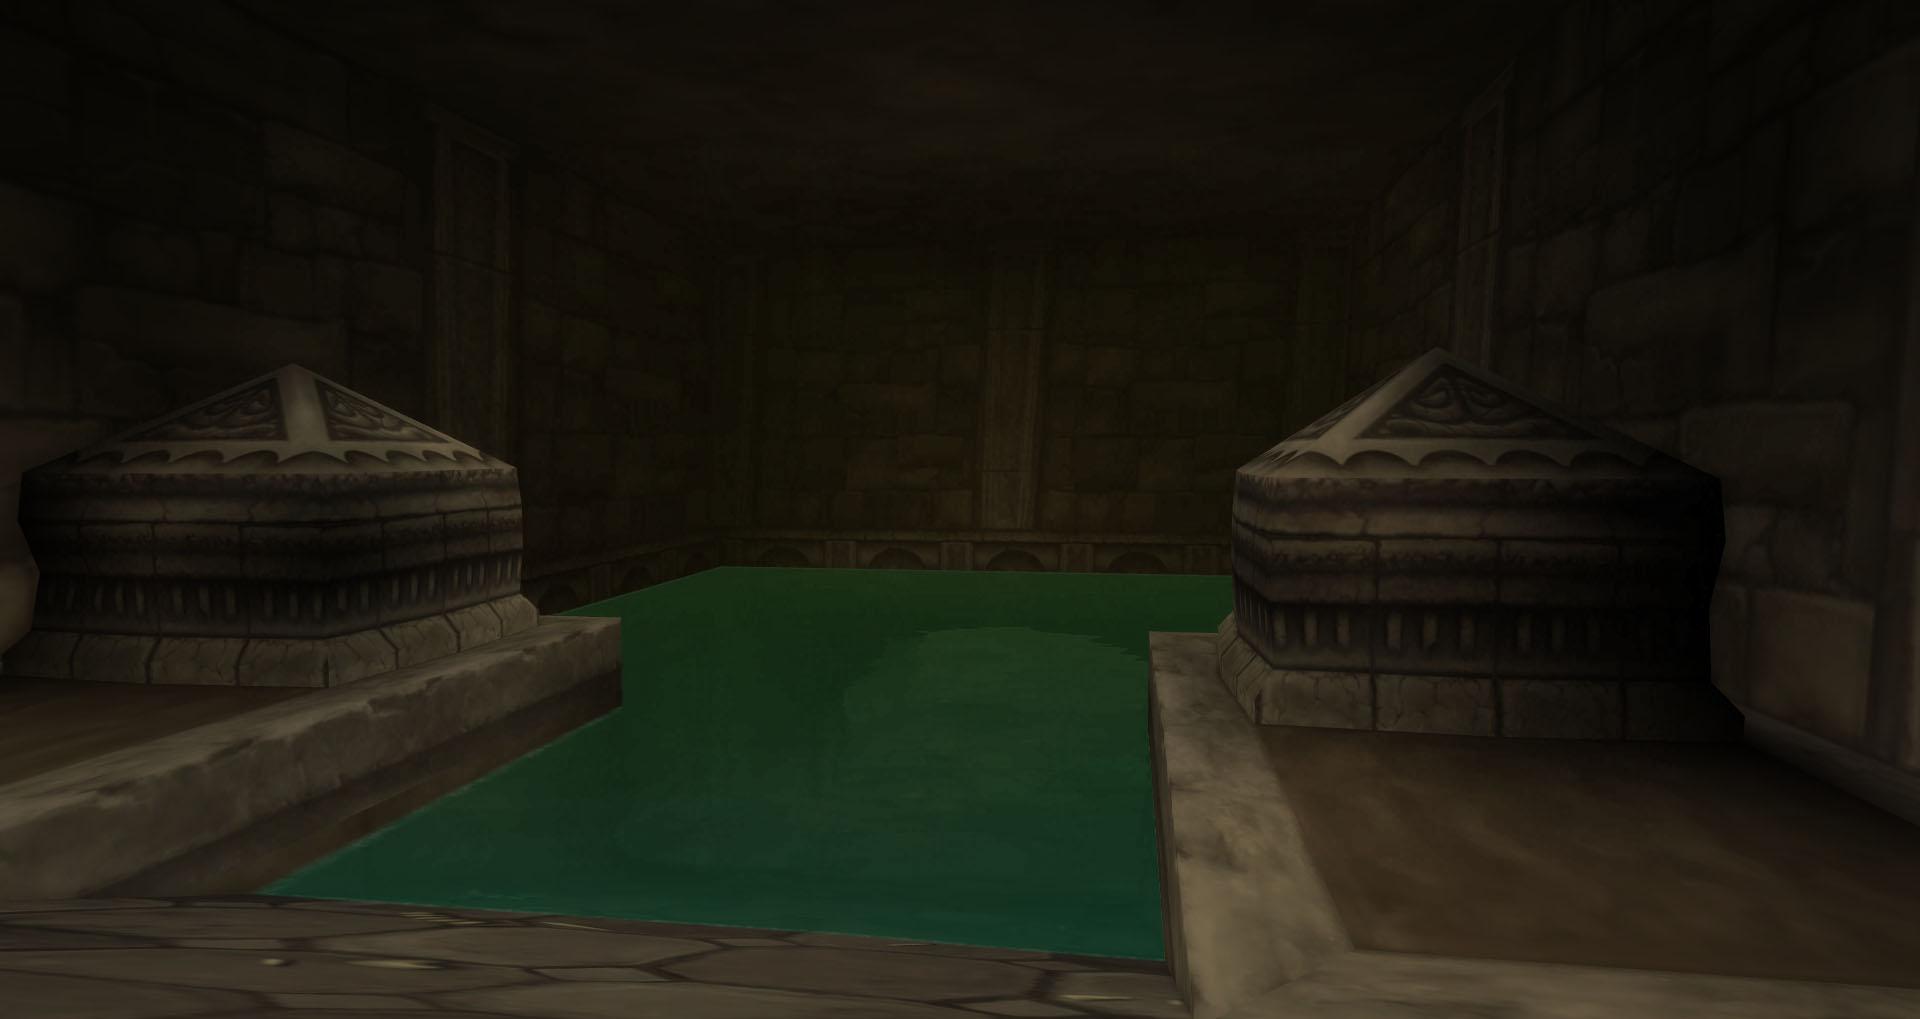 Screenshot de World of Warcraft: Lieux insolites et mystérieux.